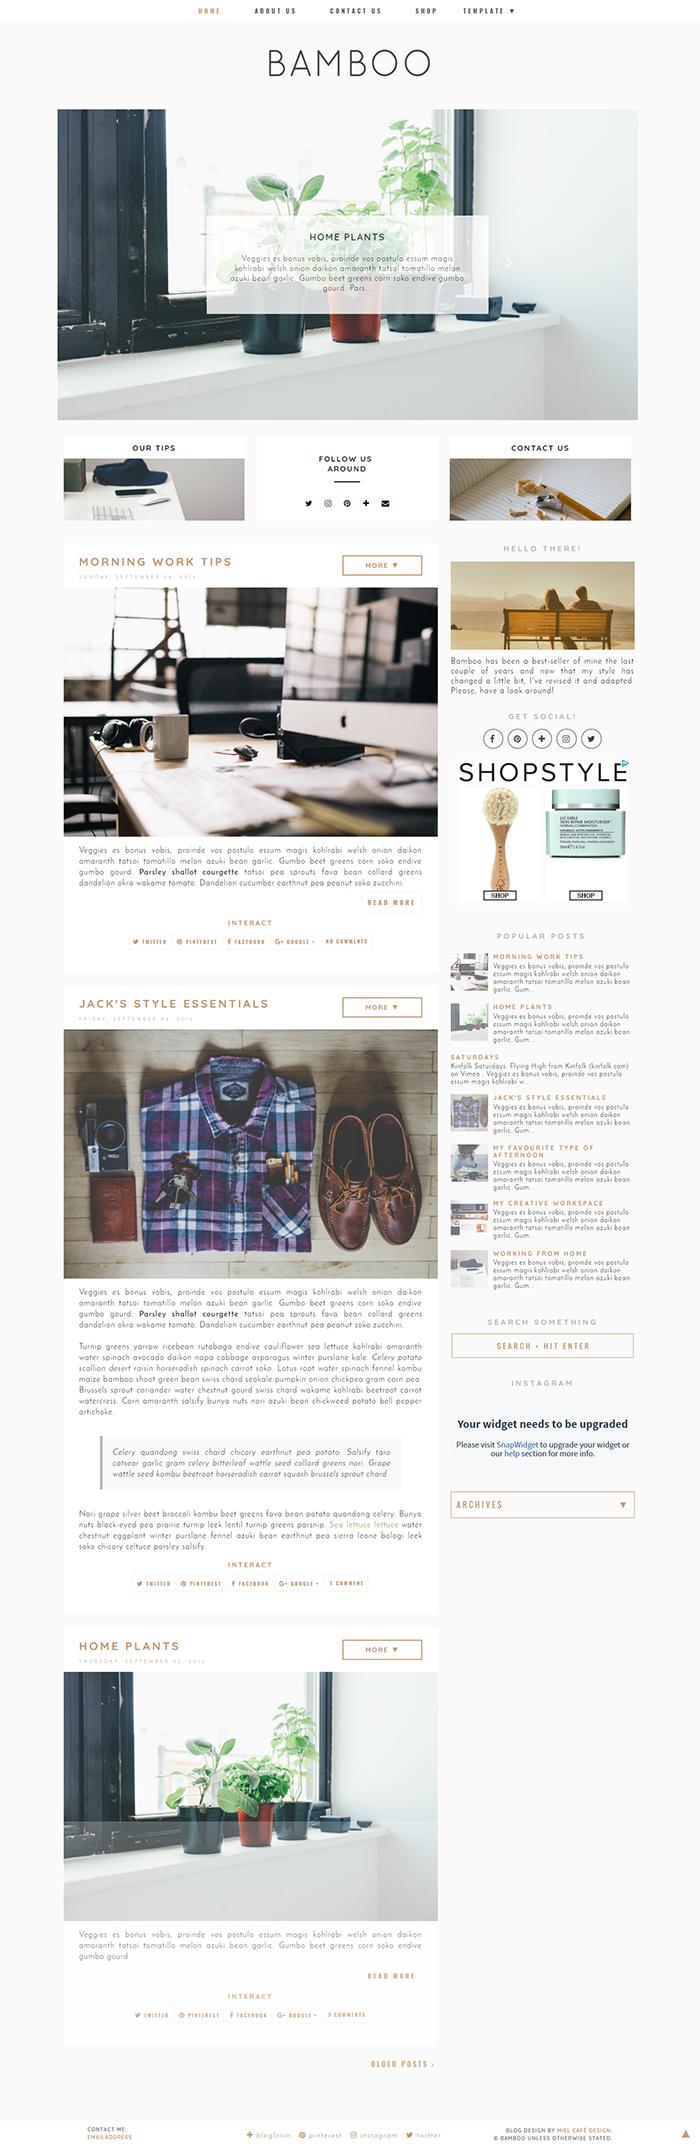 Bamboo Semi-Custom Blogger Template - Miel Café Design